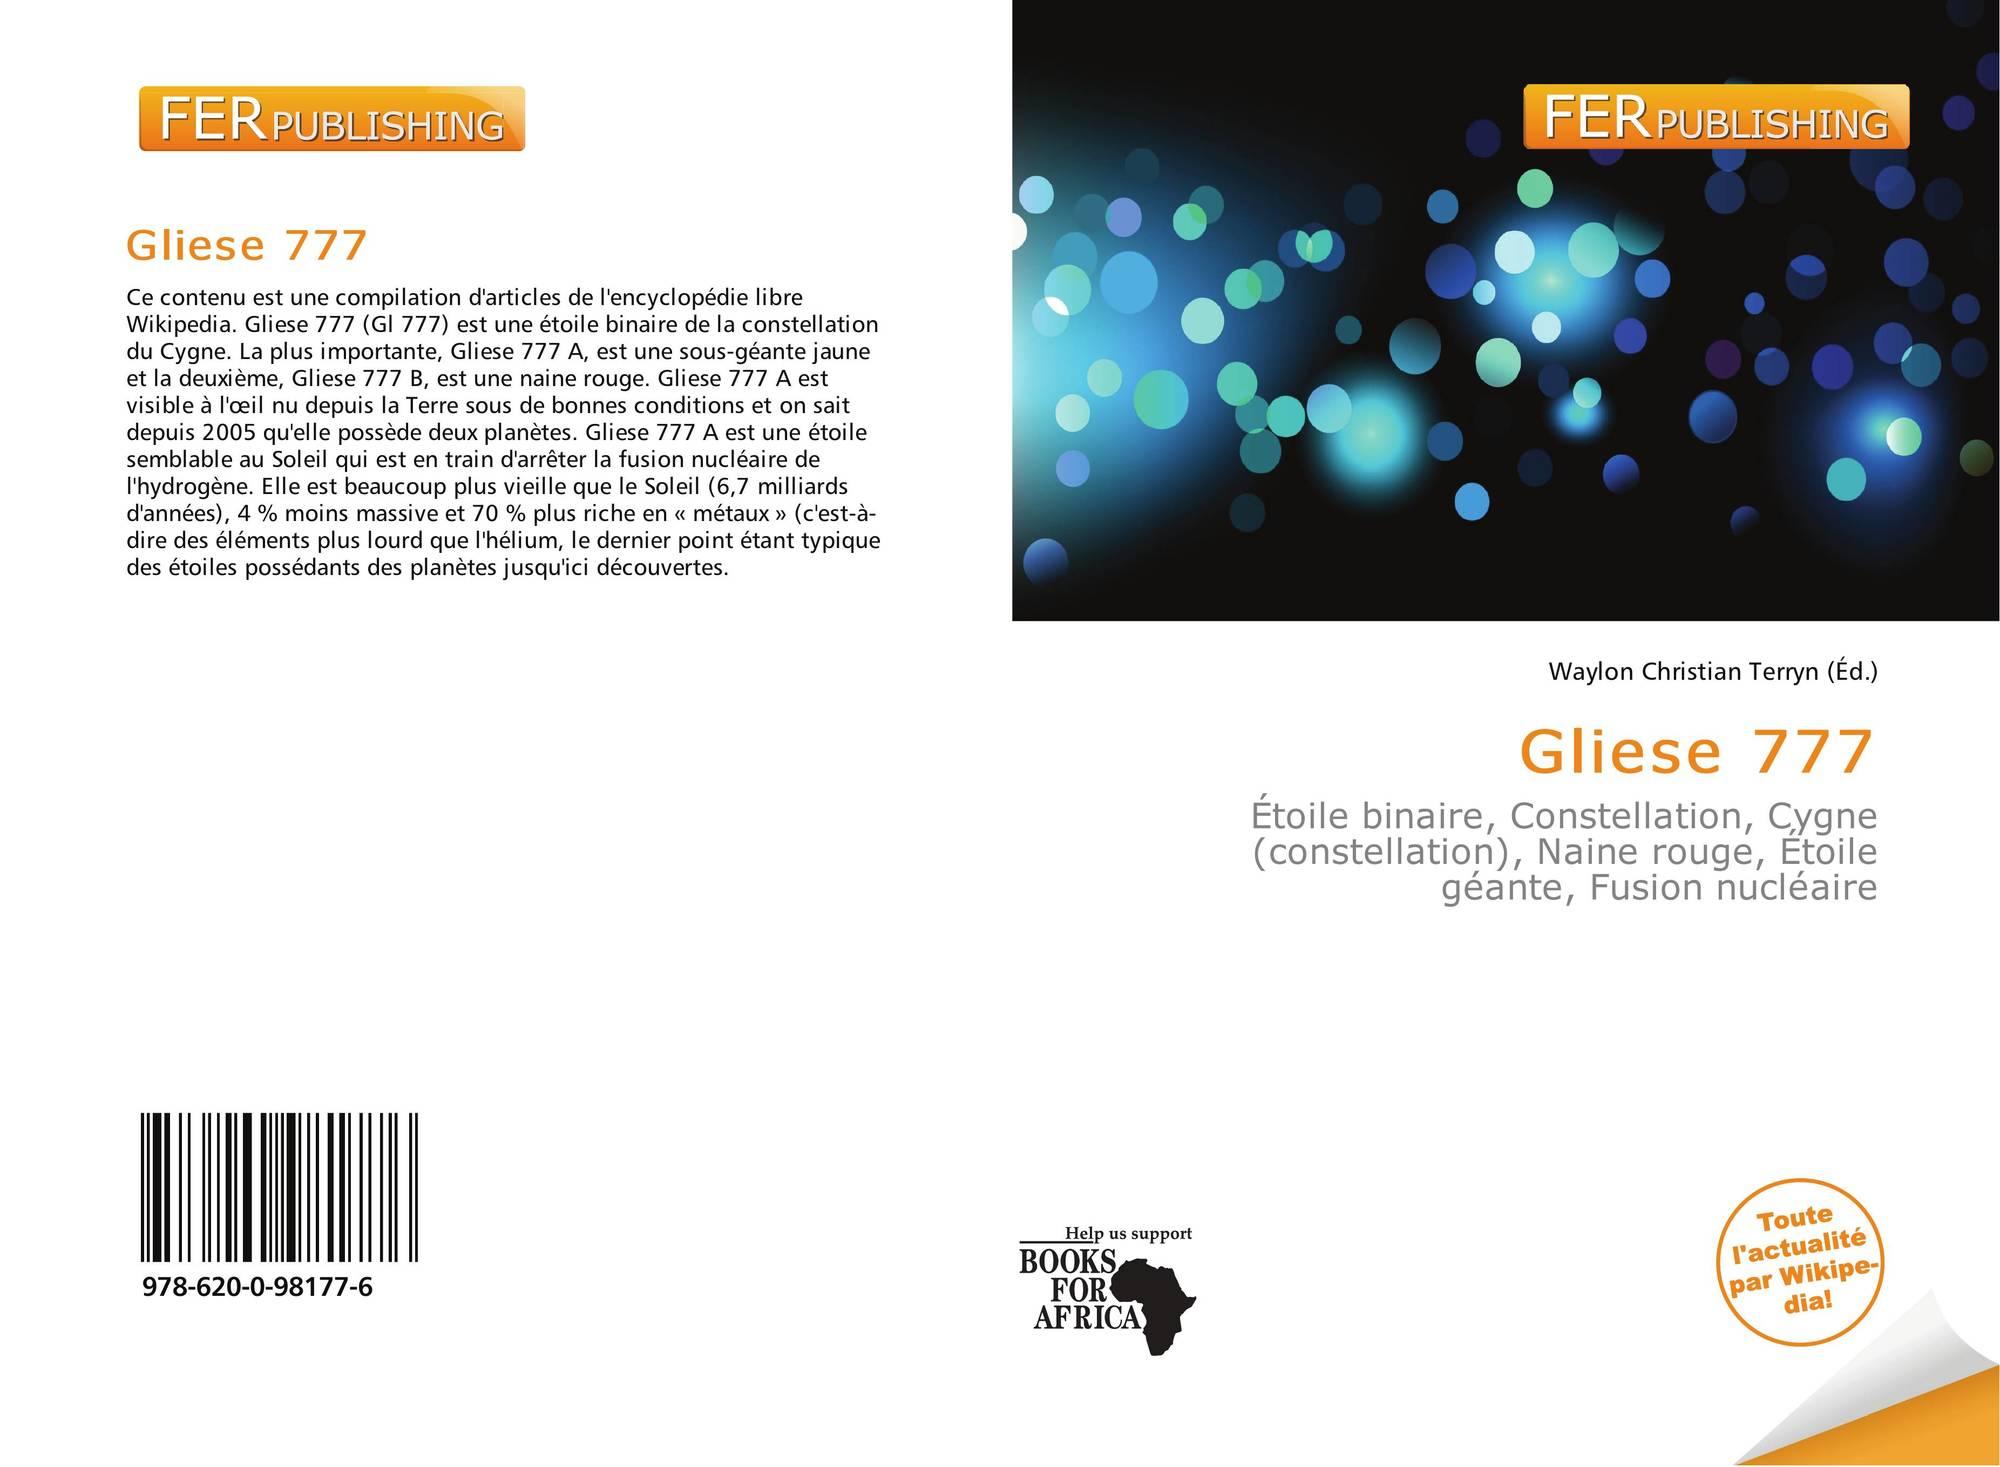 gliese 570 map - photo #32